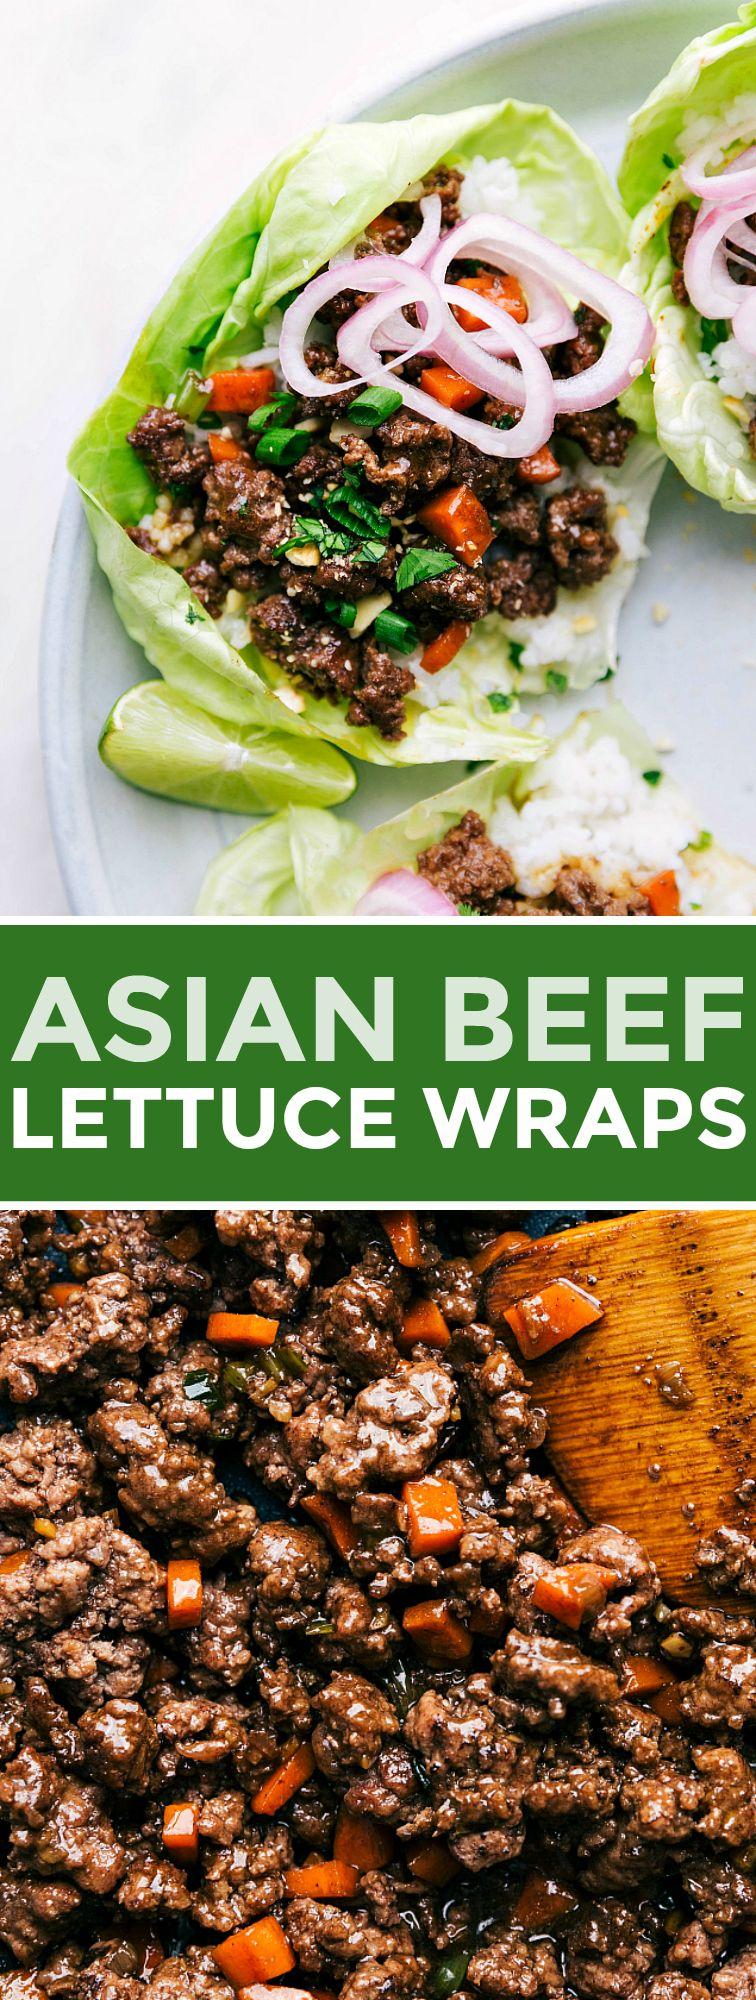 Beef Lettuce Wraps Lettuce Wrap Recipes Beef Lettuce Wraps Asian Recipes